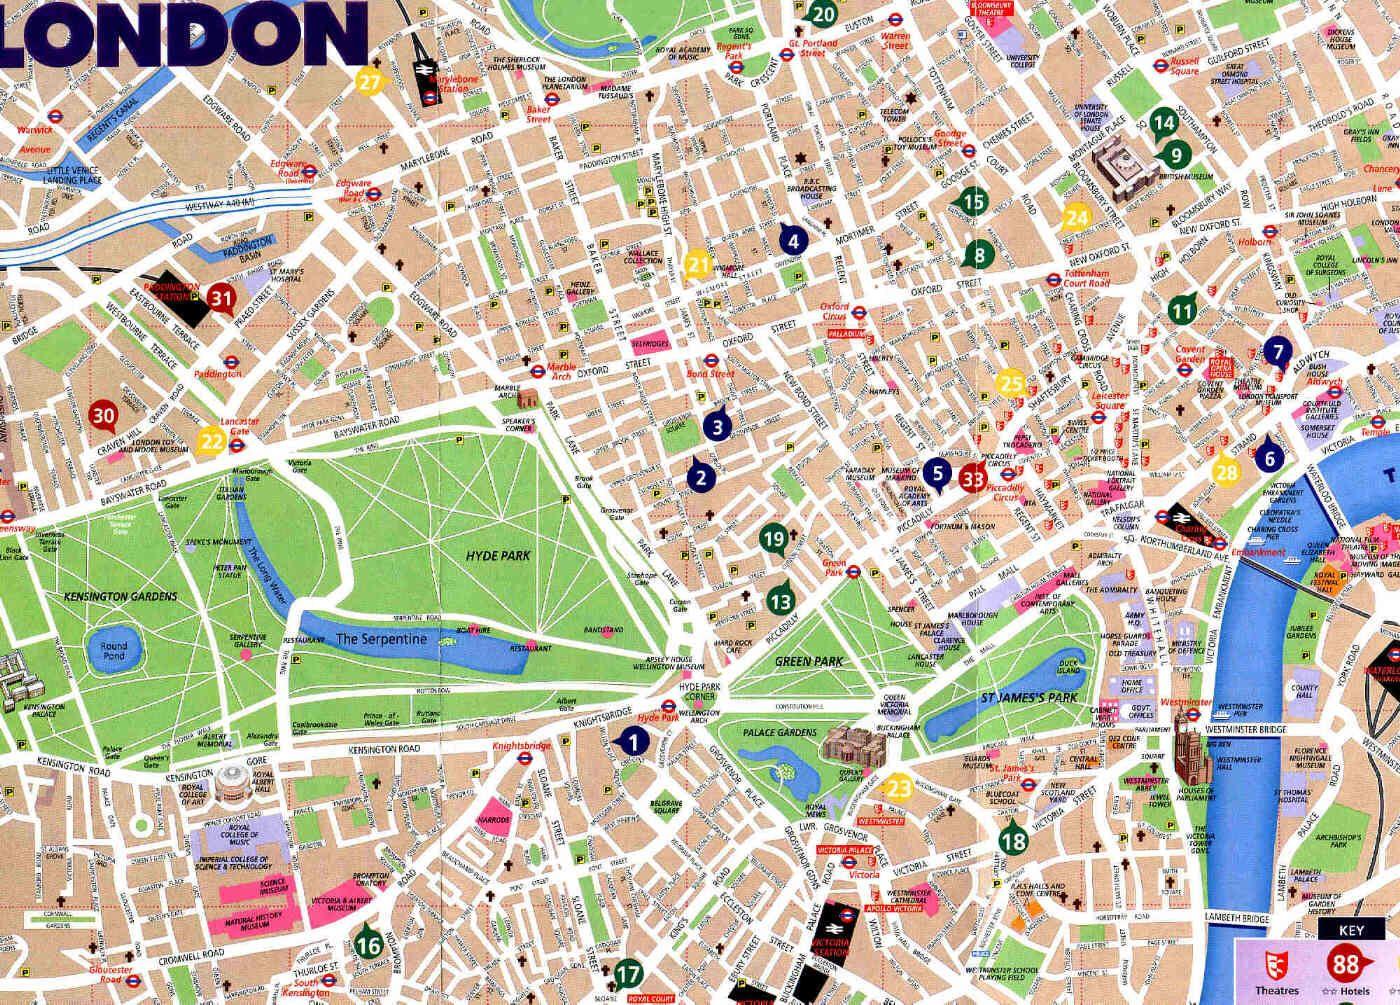 Map Of London Centre.Street Maps London Street Map Maps London Map Street Map Of